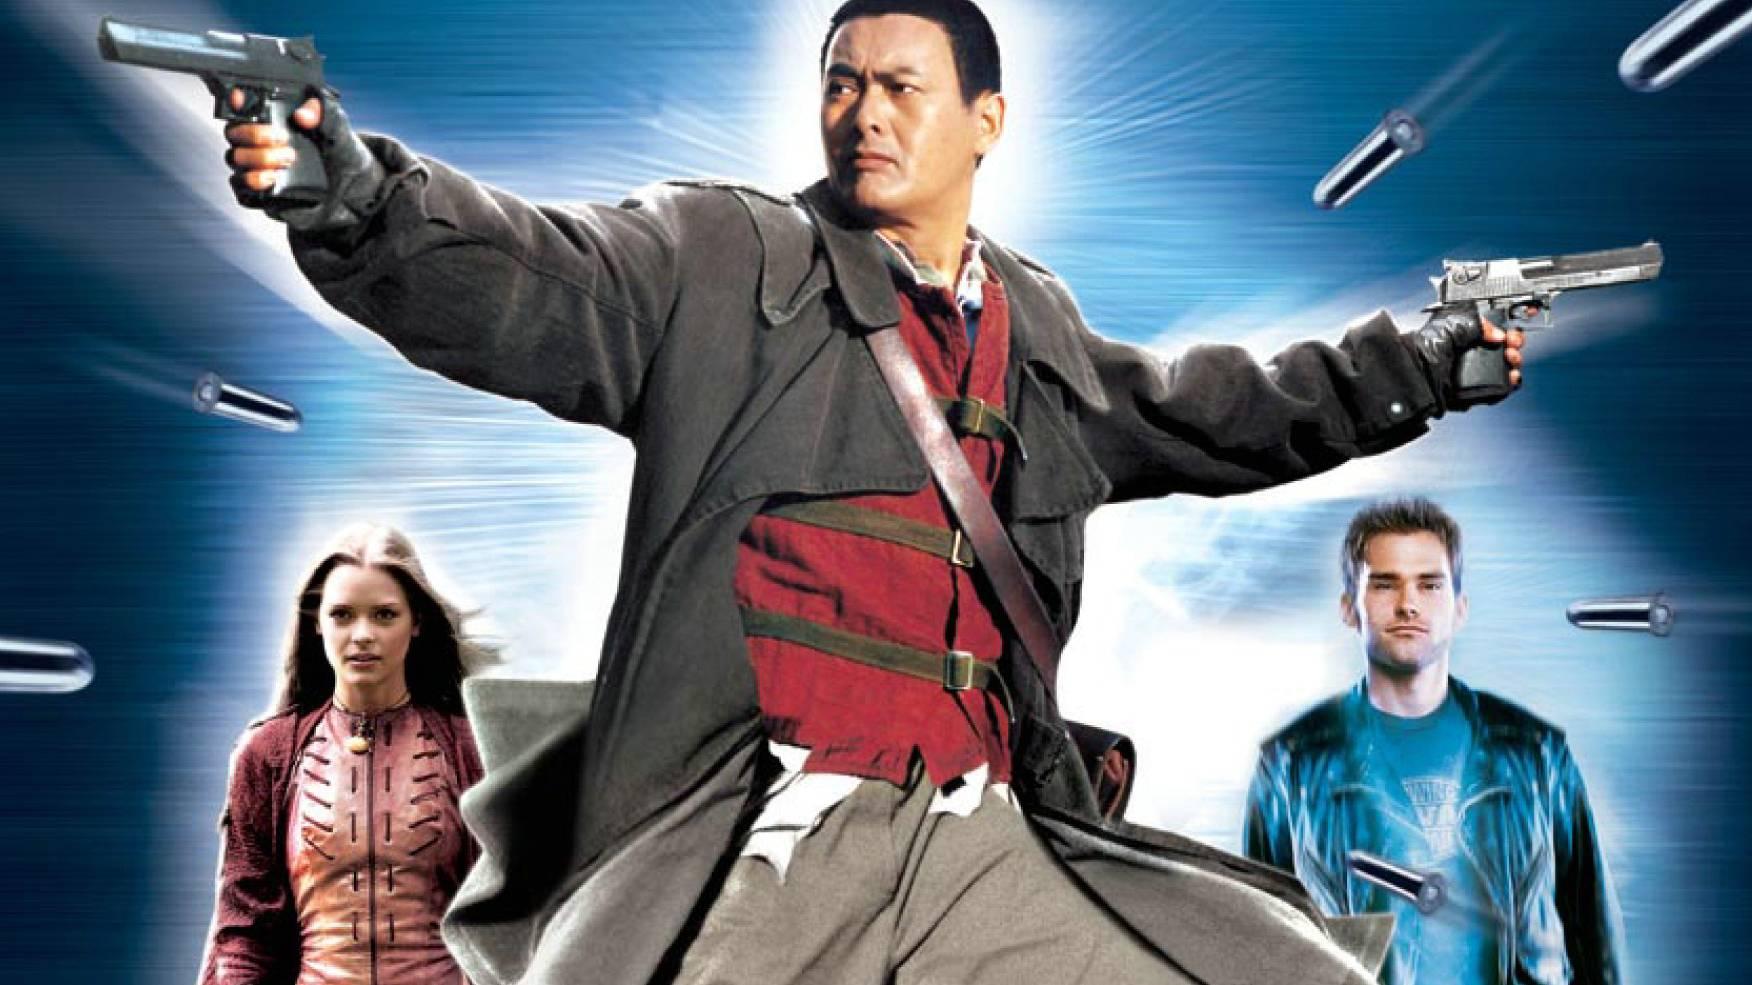 Bulletproof Monk - Der kugelsichere Mönch